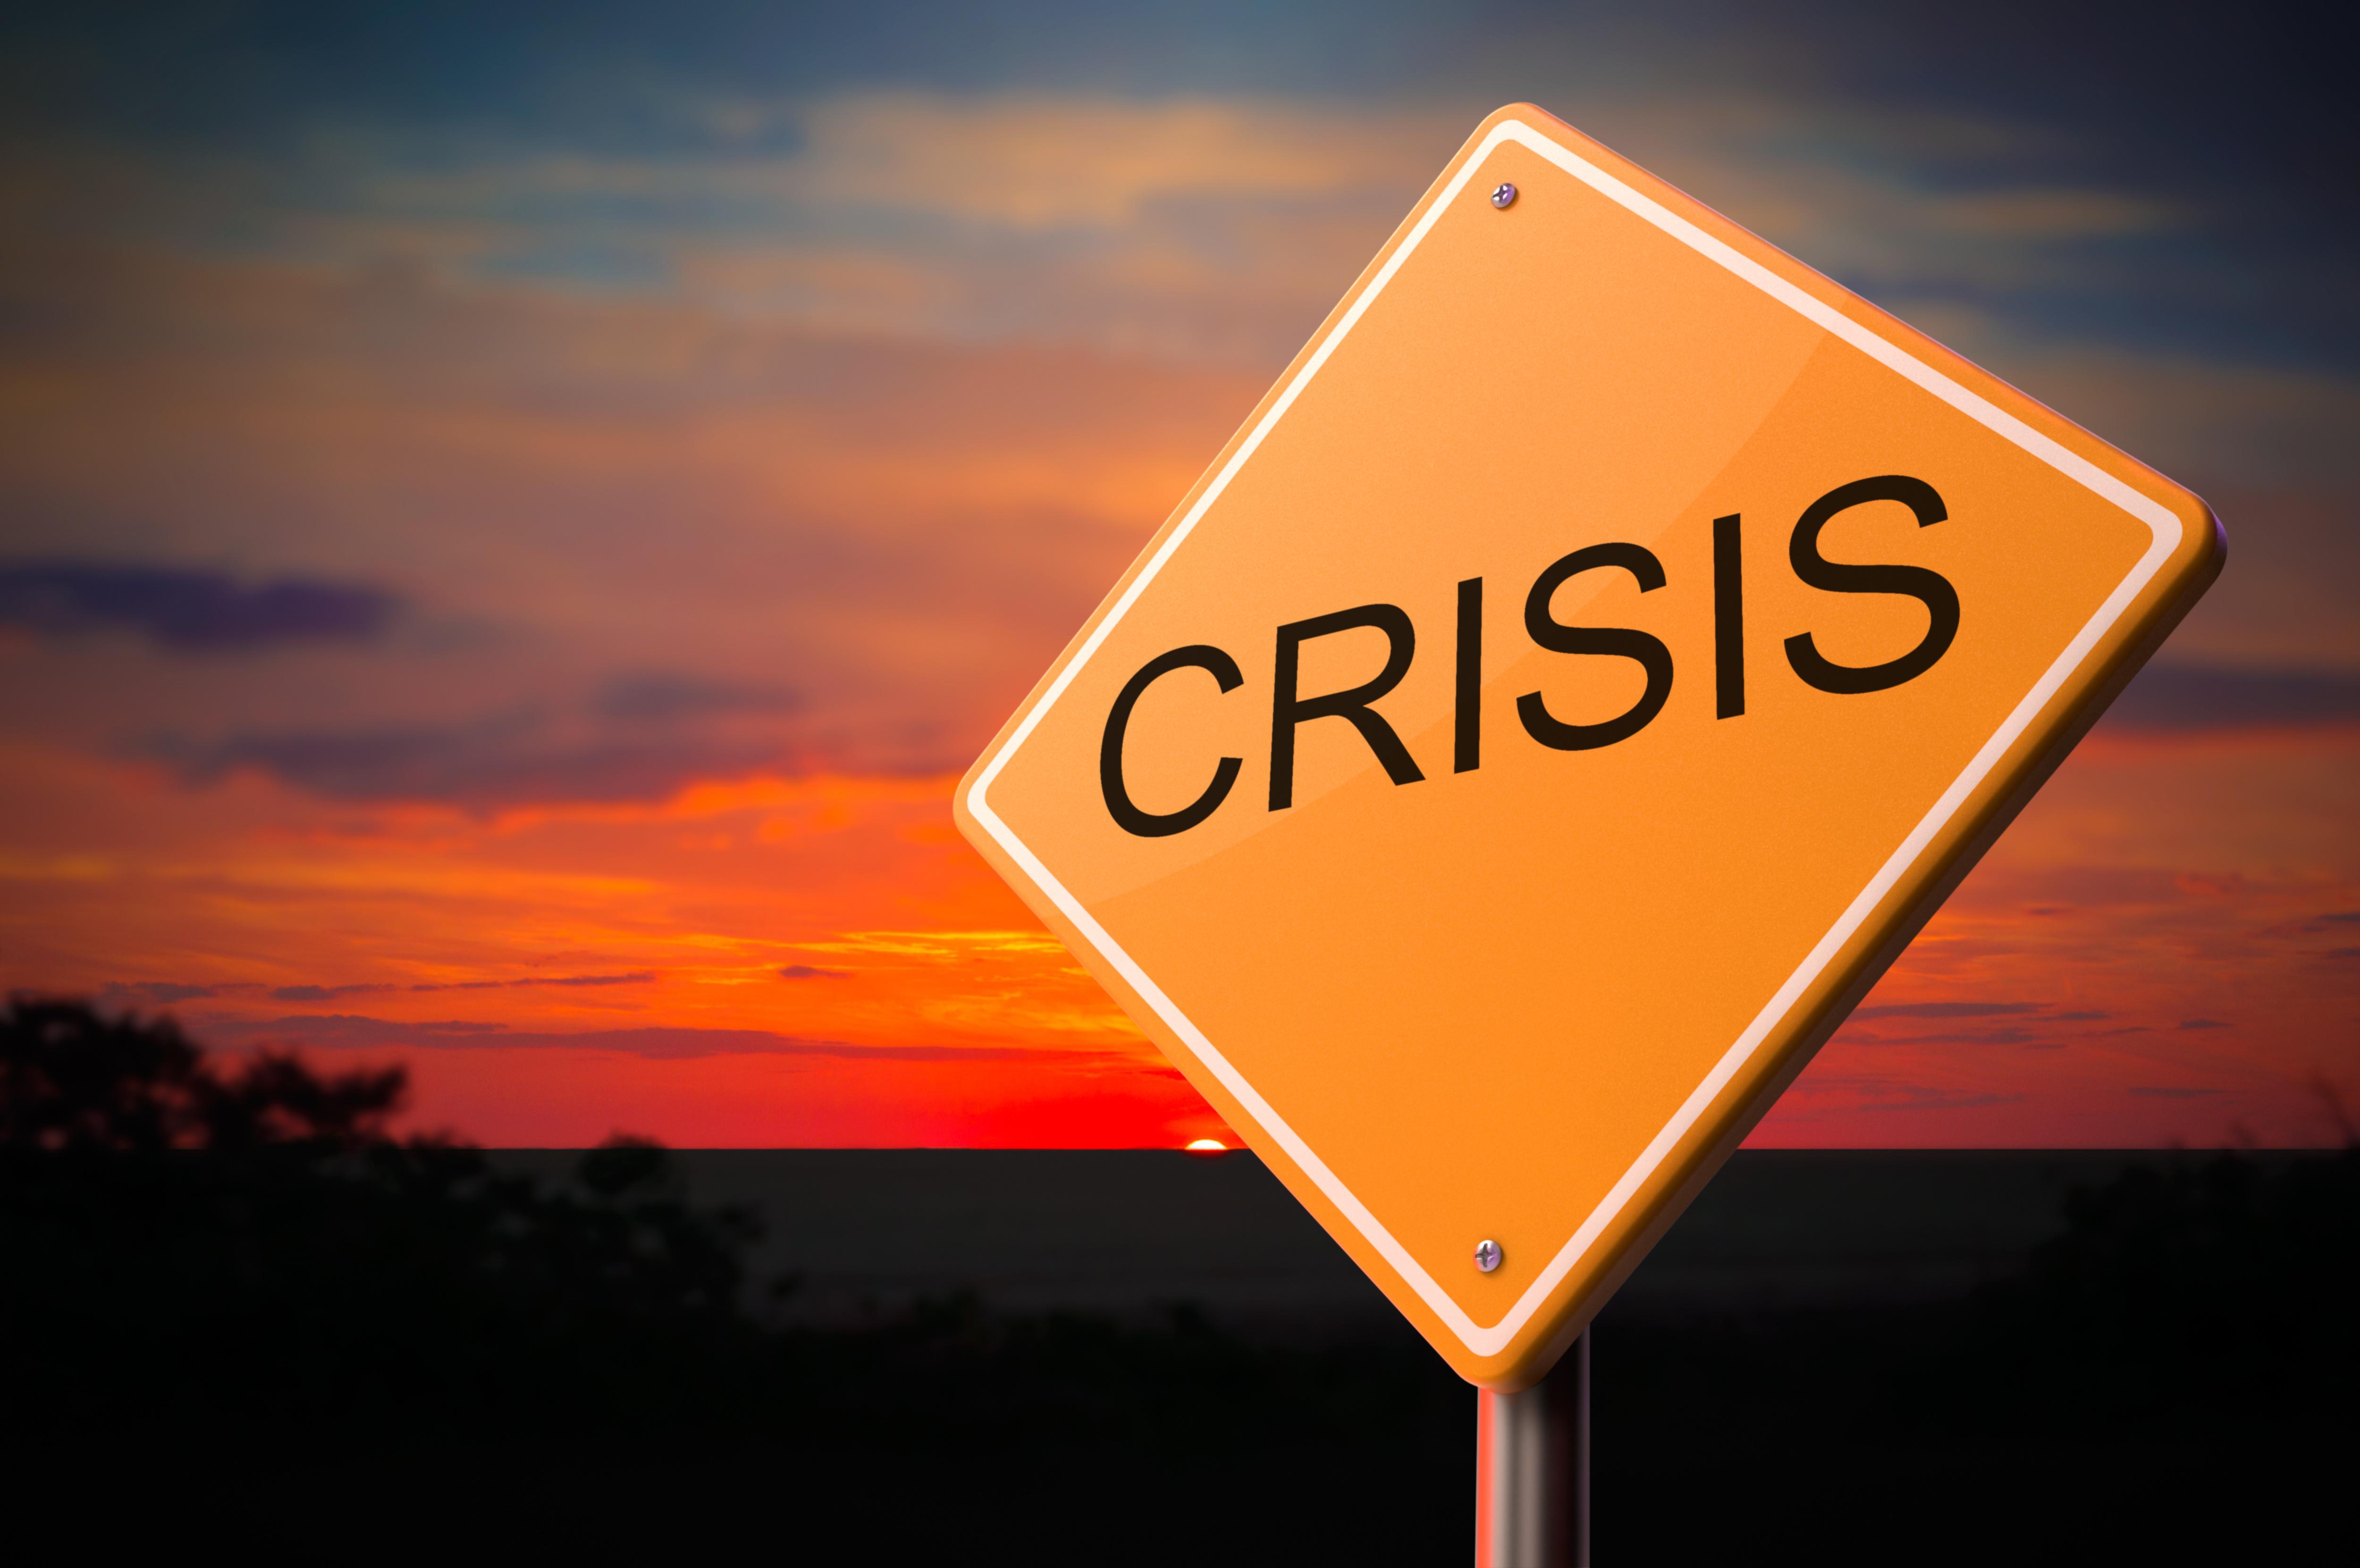 https://assets.sourcemedia.com/a6/cd/e8dddb004e18b622d8b5f0fa3653/crisis.jpeg